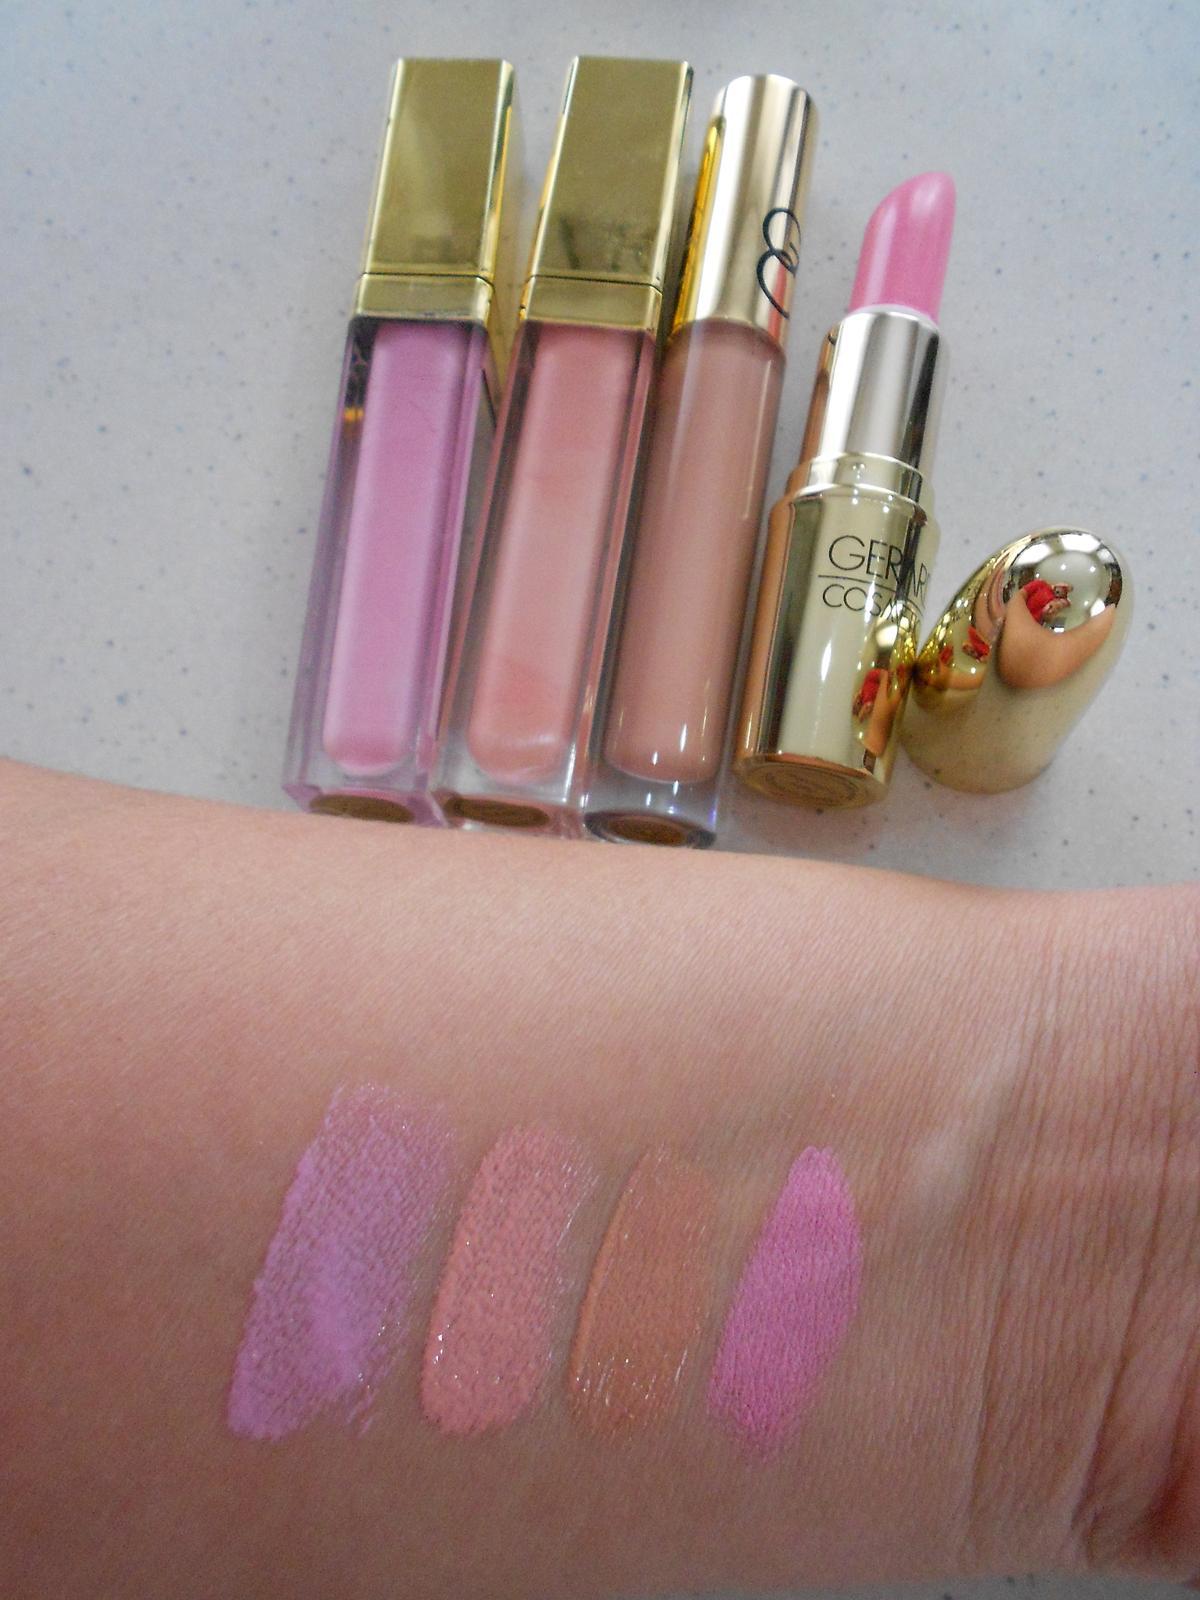 Gerard Cosmetics rúže - Obrázok č. 1